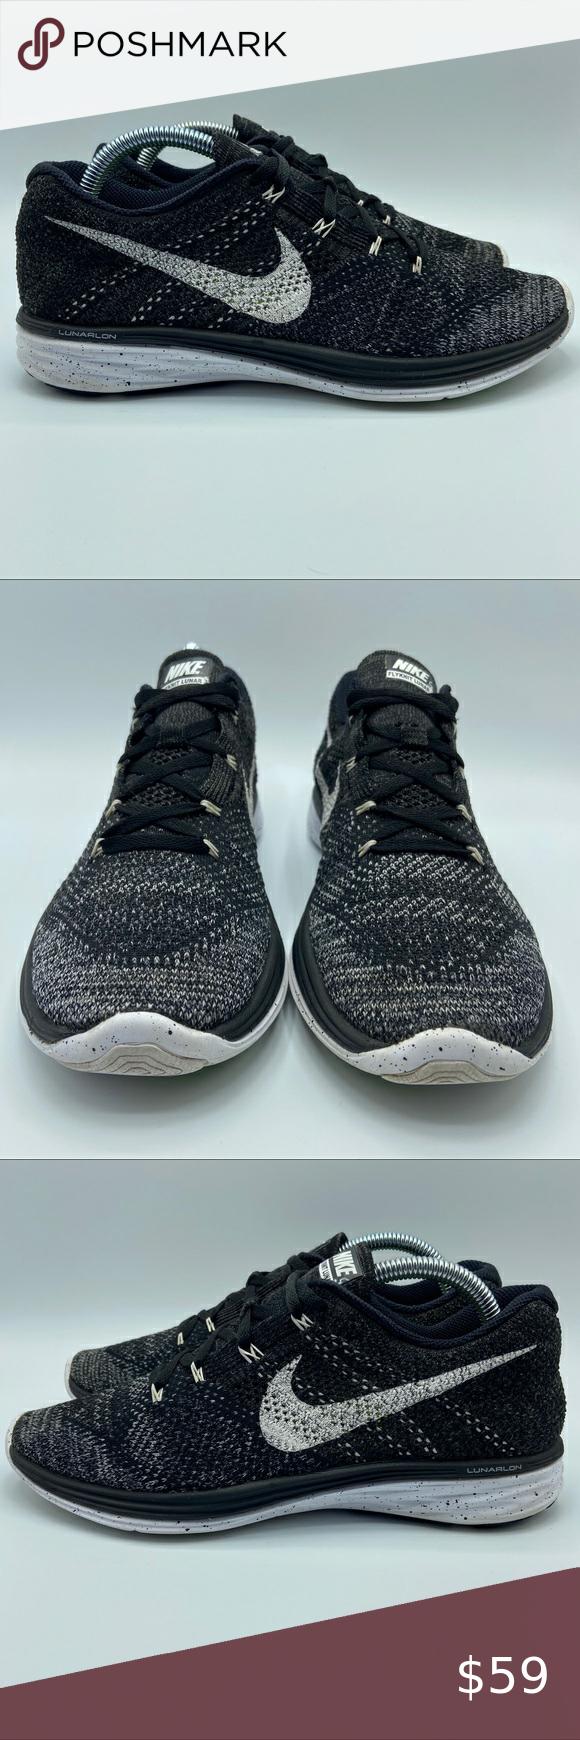 Nike Flynit Lunar 3 Oreo Womens Size 10 Nike Flyknit Lunar 3 Women S Running Shoes Black White Size 10 6 Black Running Shoes Womens Running Shoes Womens Sizes